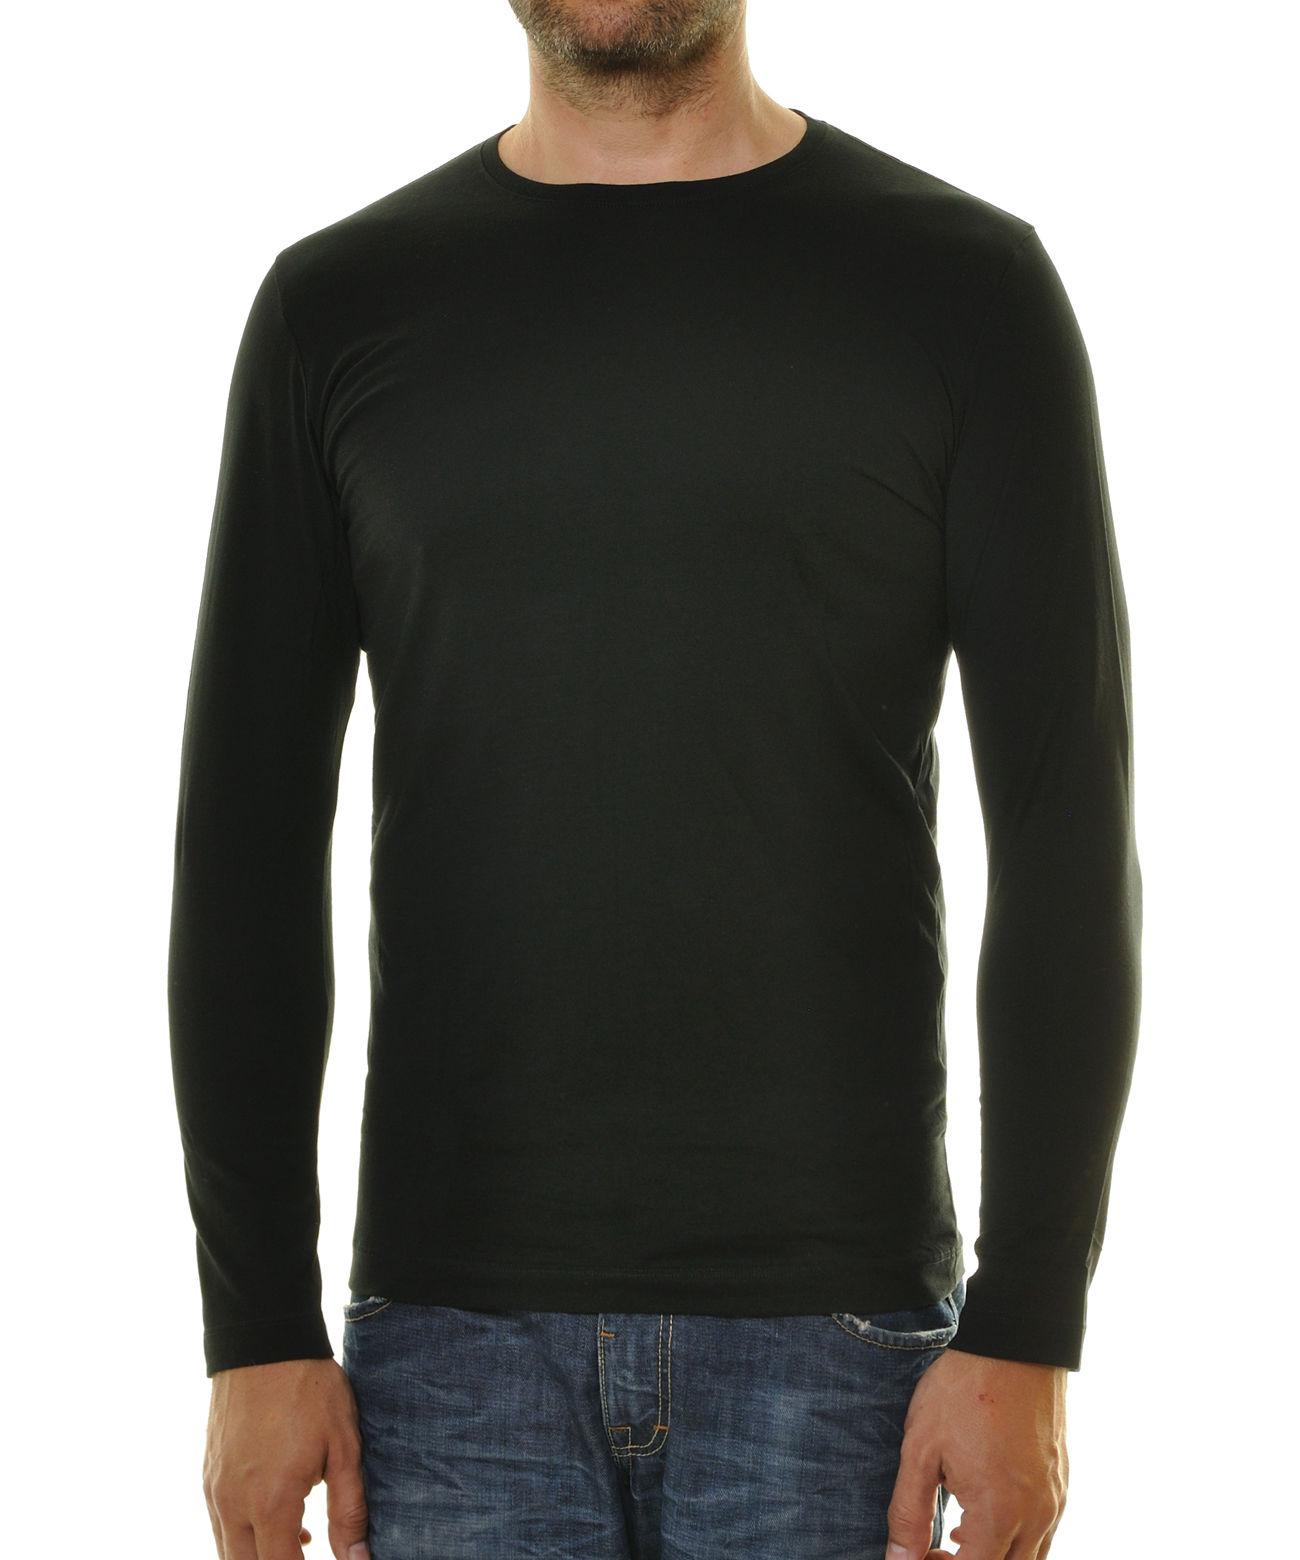 07ee24efc1c Ισοθερμική Ανδρική Μπλούζα μπλούζα με μακρύ μανίκι μόνο στο BUSTO